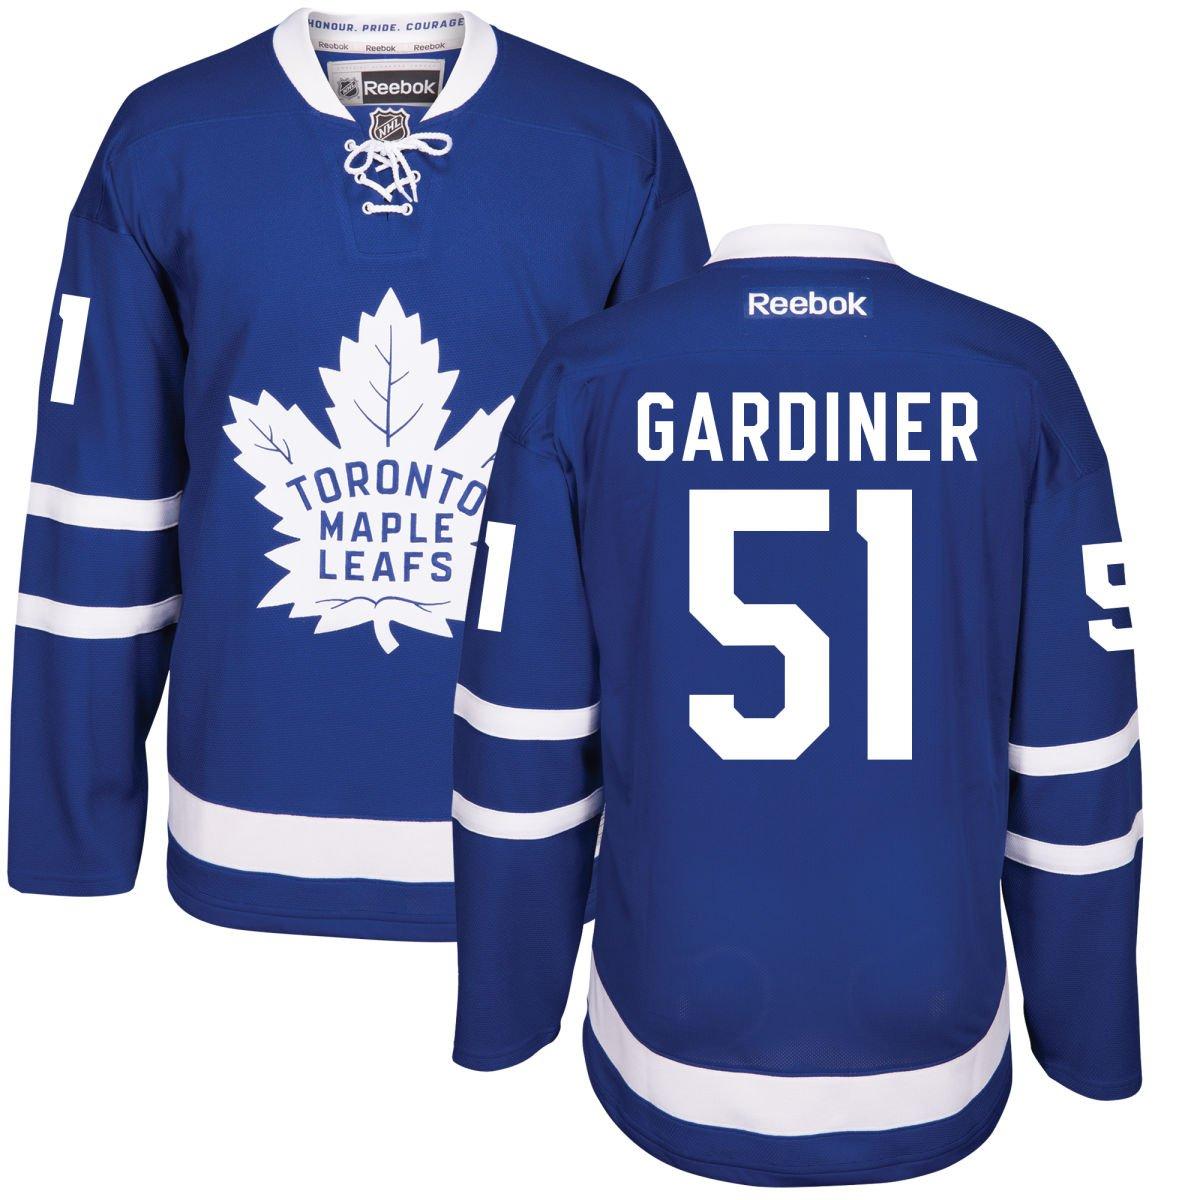 Jake Gardiner Toronto Maple Leafs Home Jersey Reebok